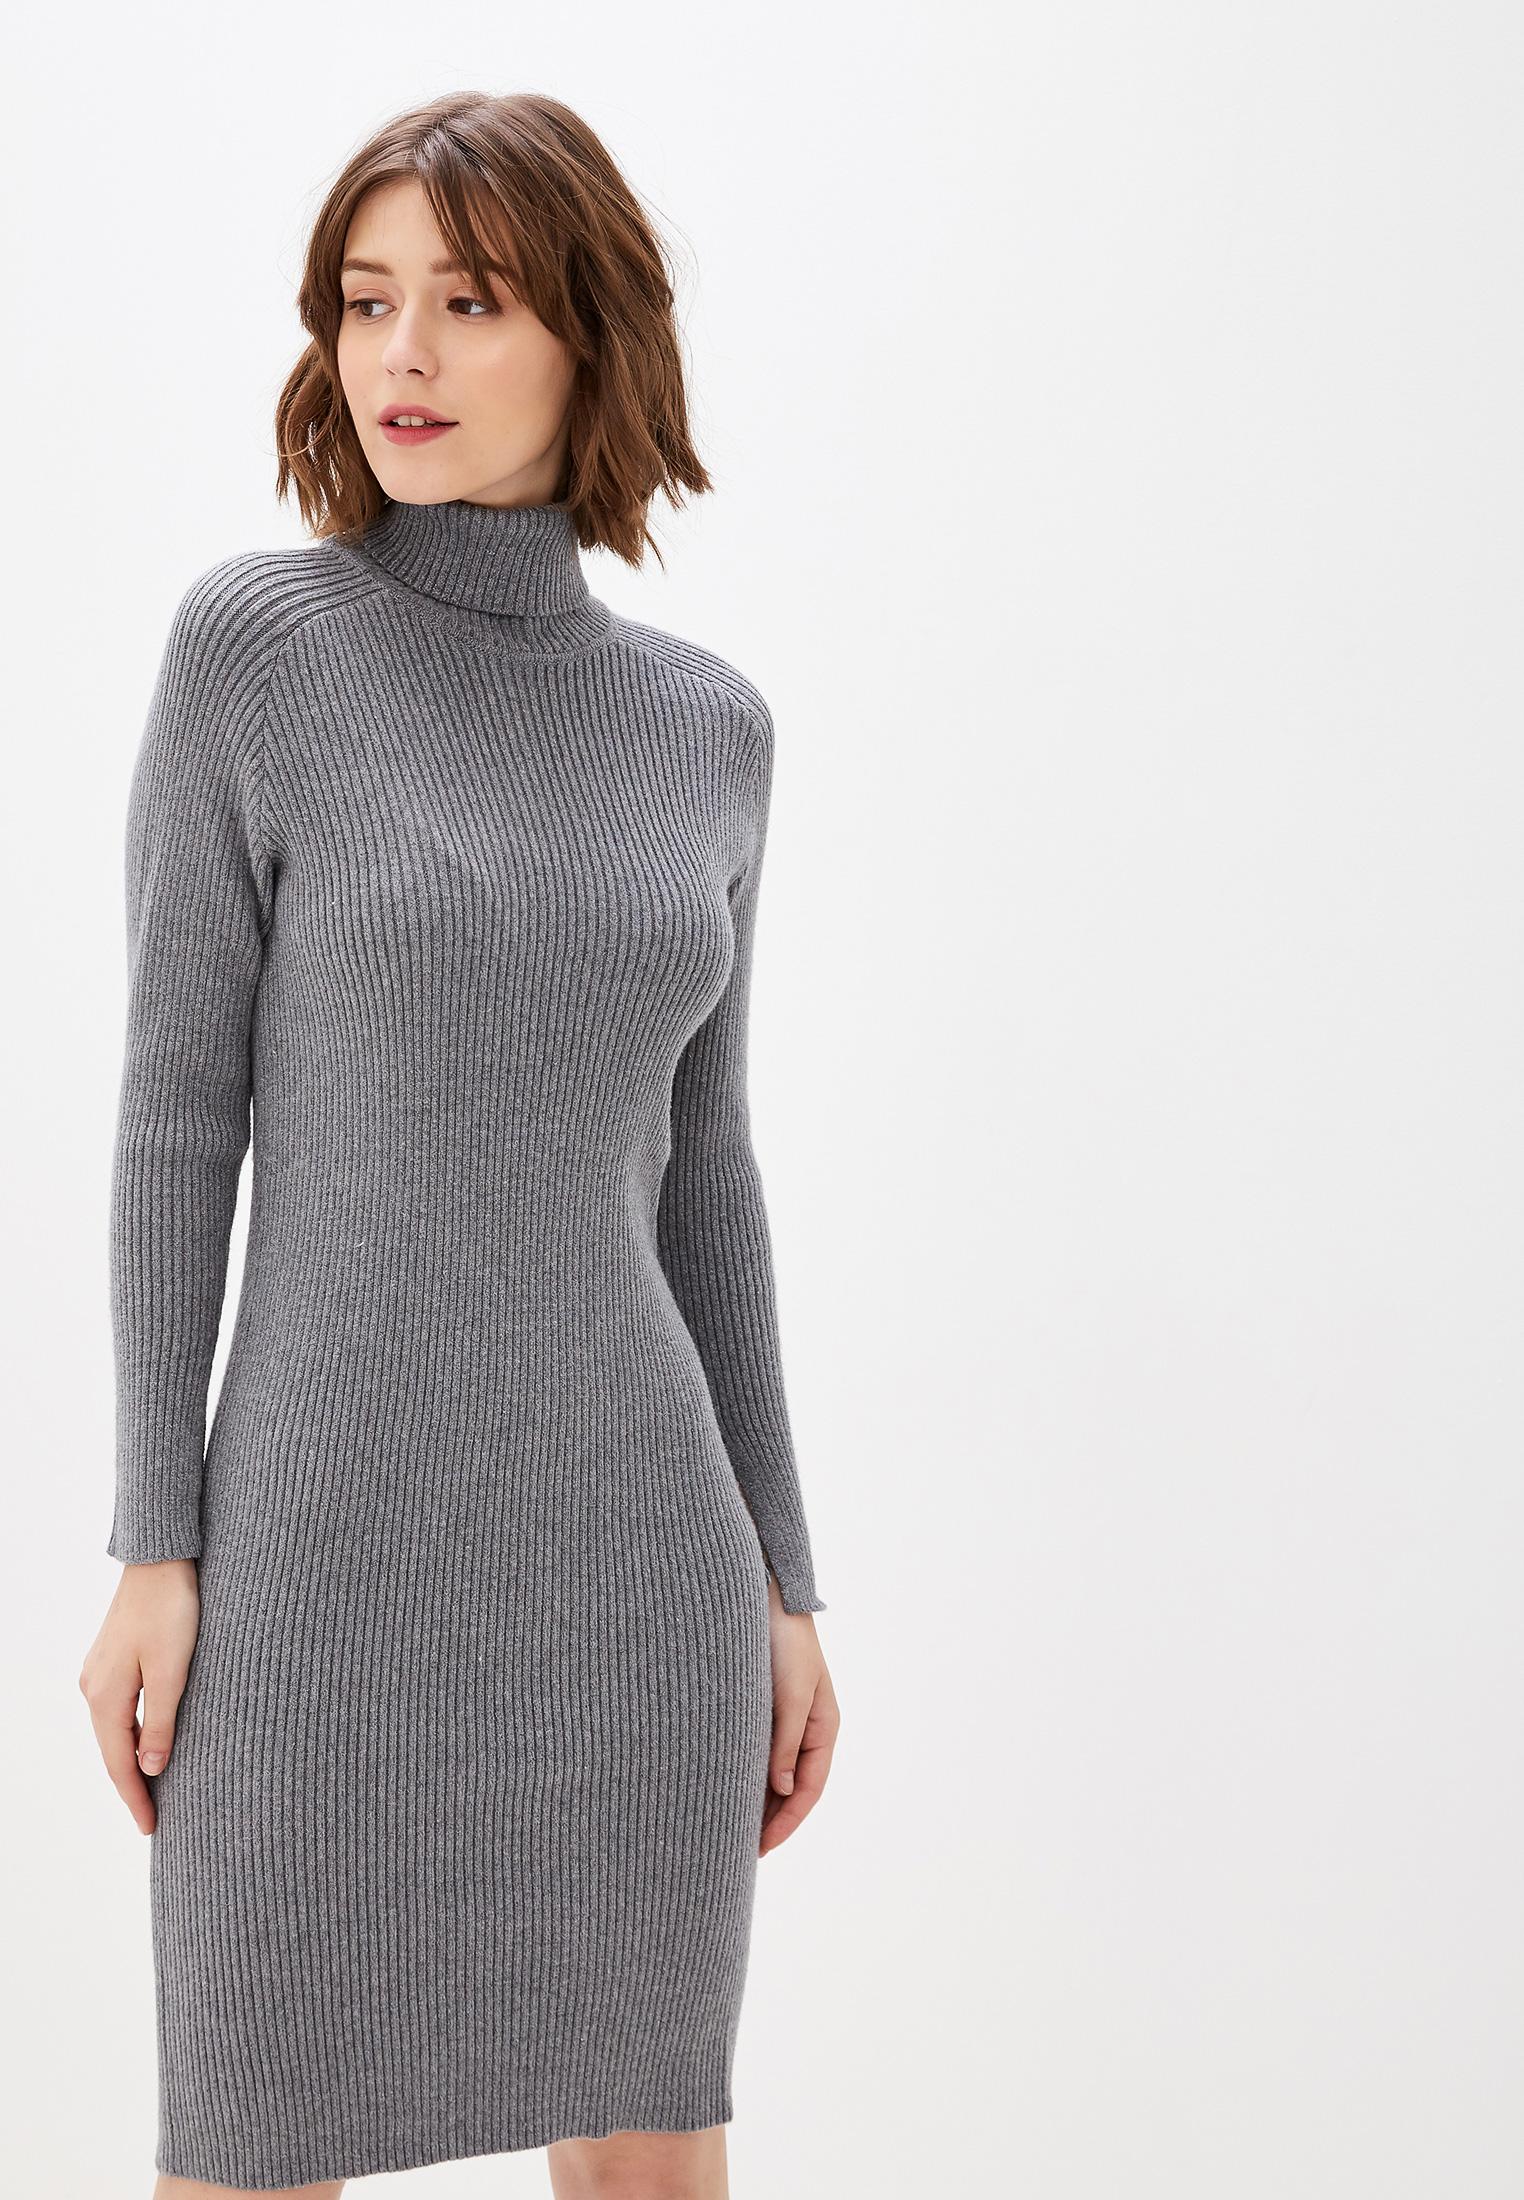 Вязаное платье Sela (Сэла) DSw-117/1283-9443